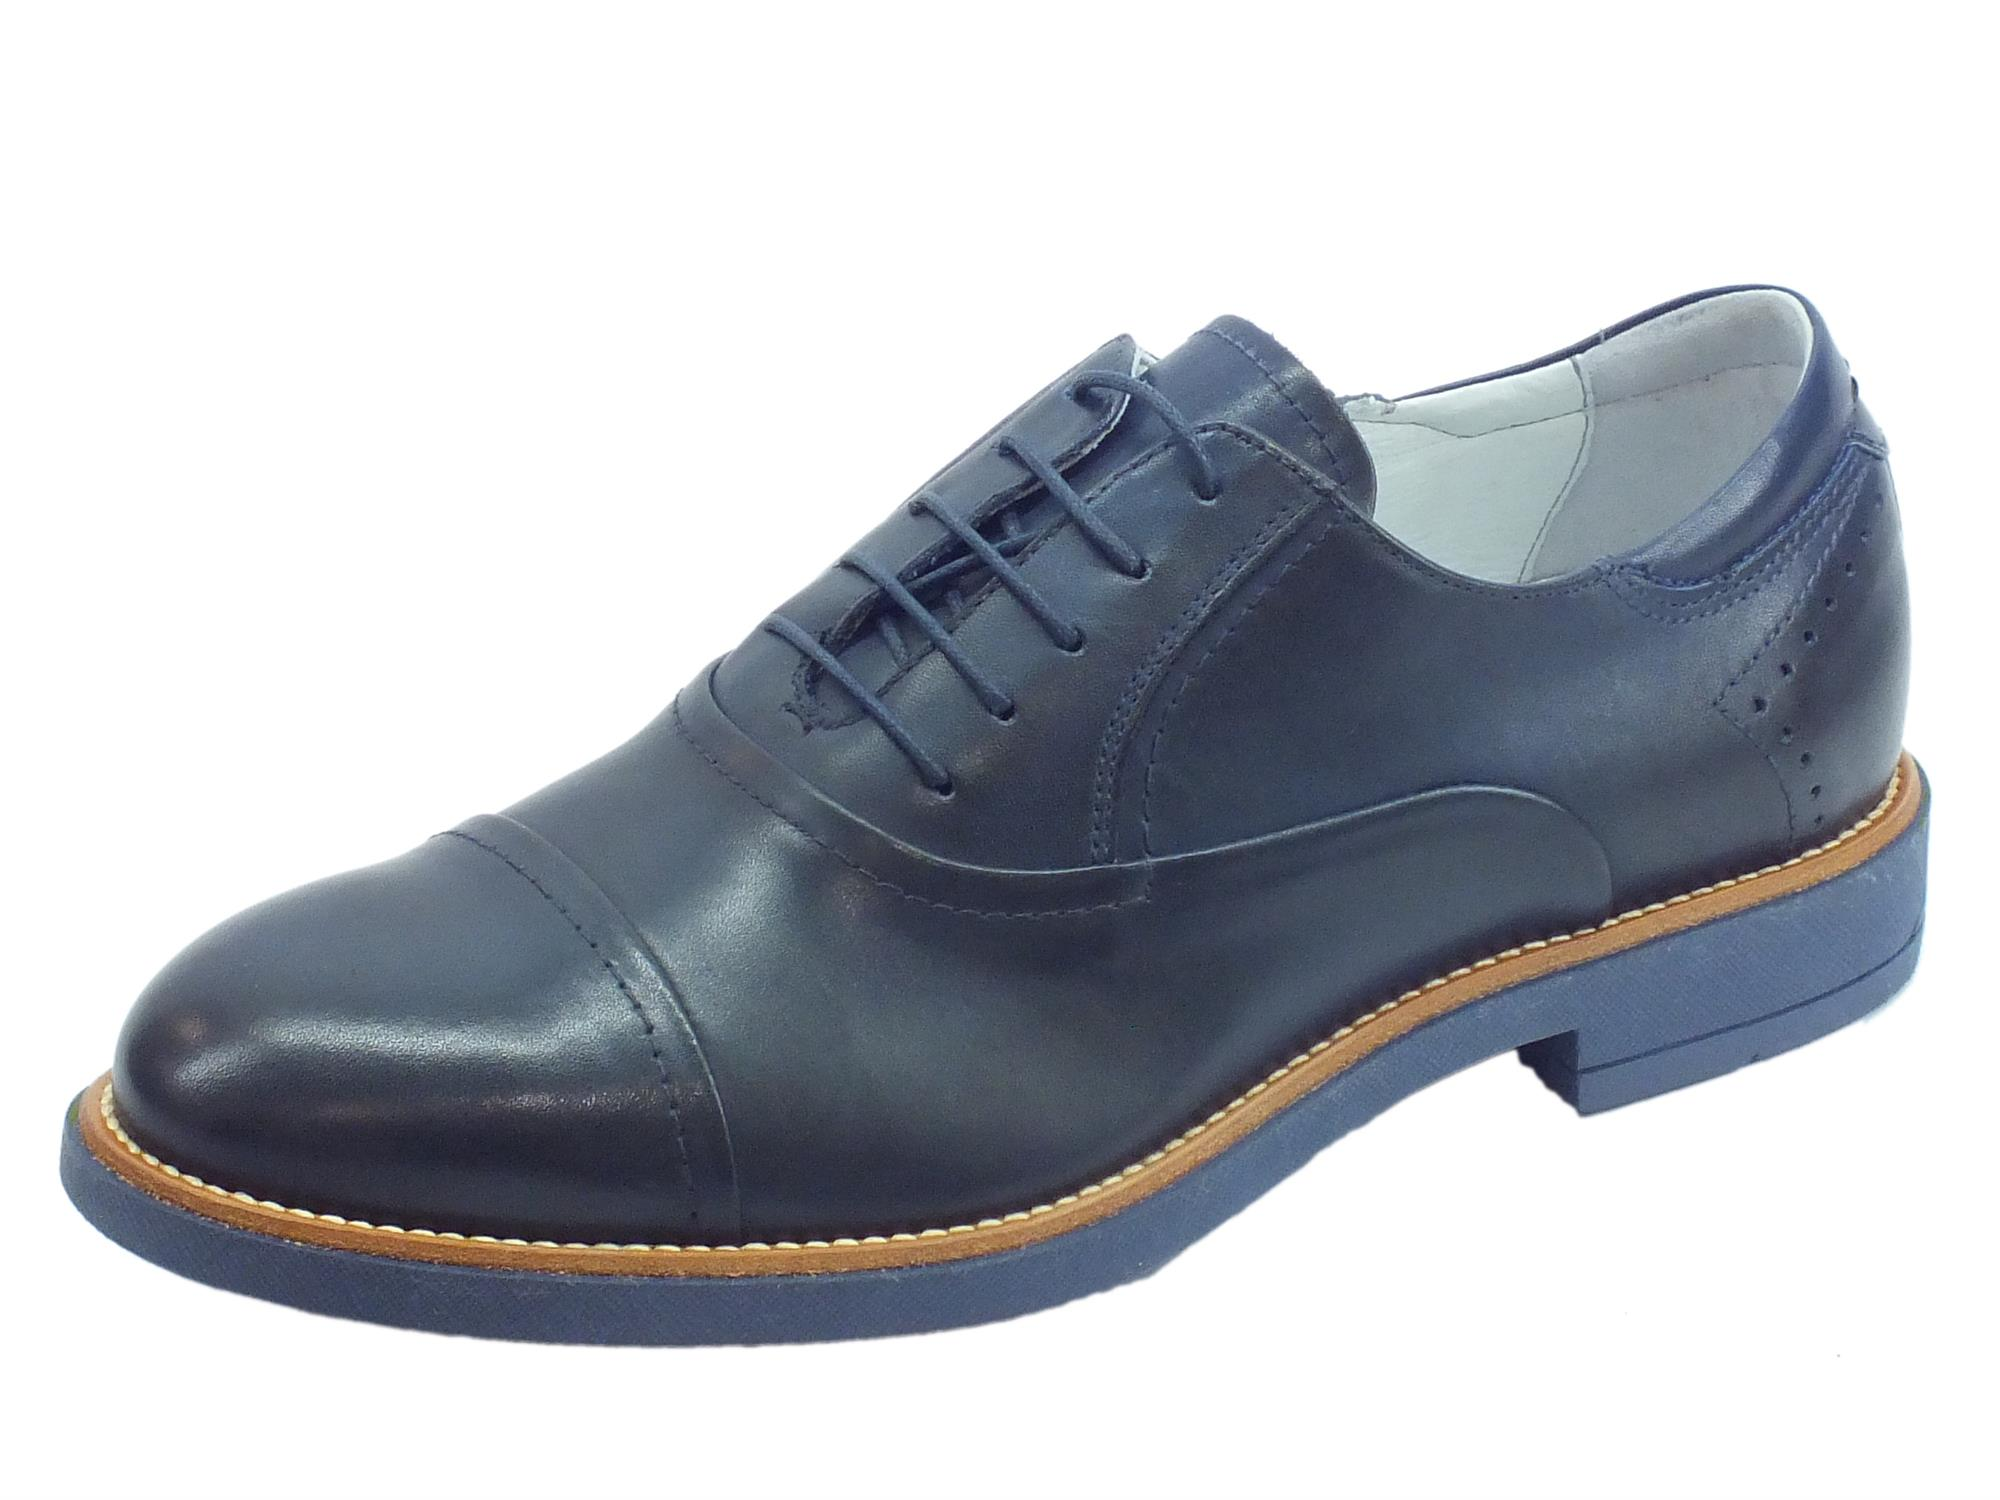 stili di grande varietà Super sconto garanzia di alta qualità Scarpe eleganti NeroGiardini per uomo in pelle blu fodera e sottopiede in  pelle